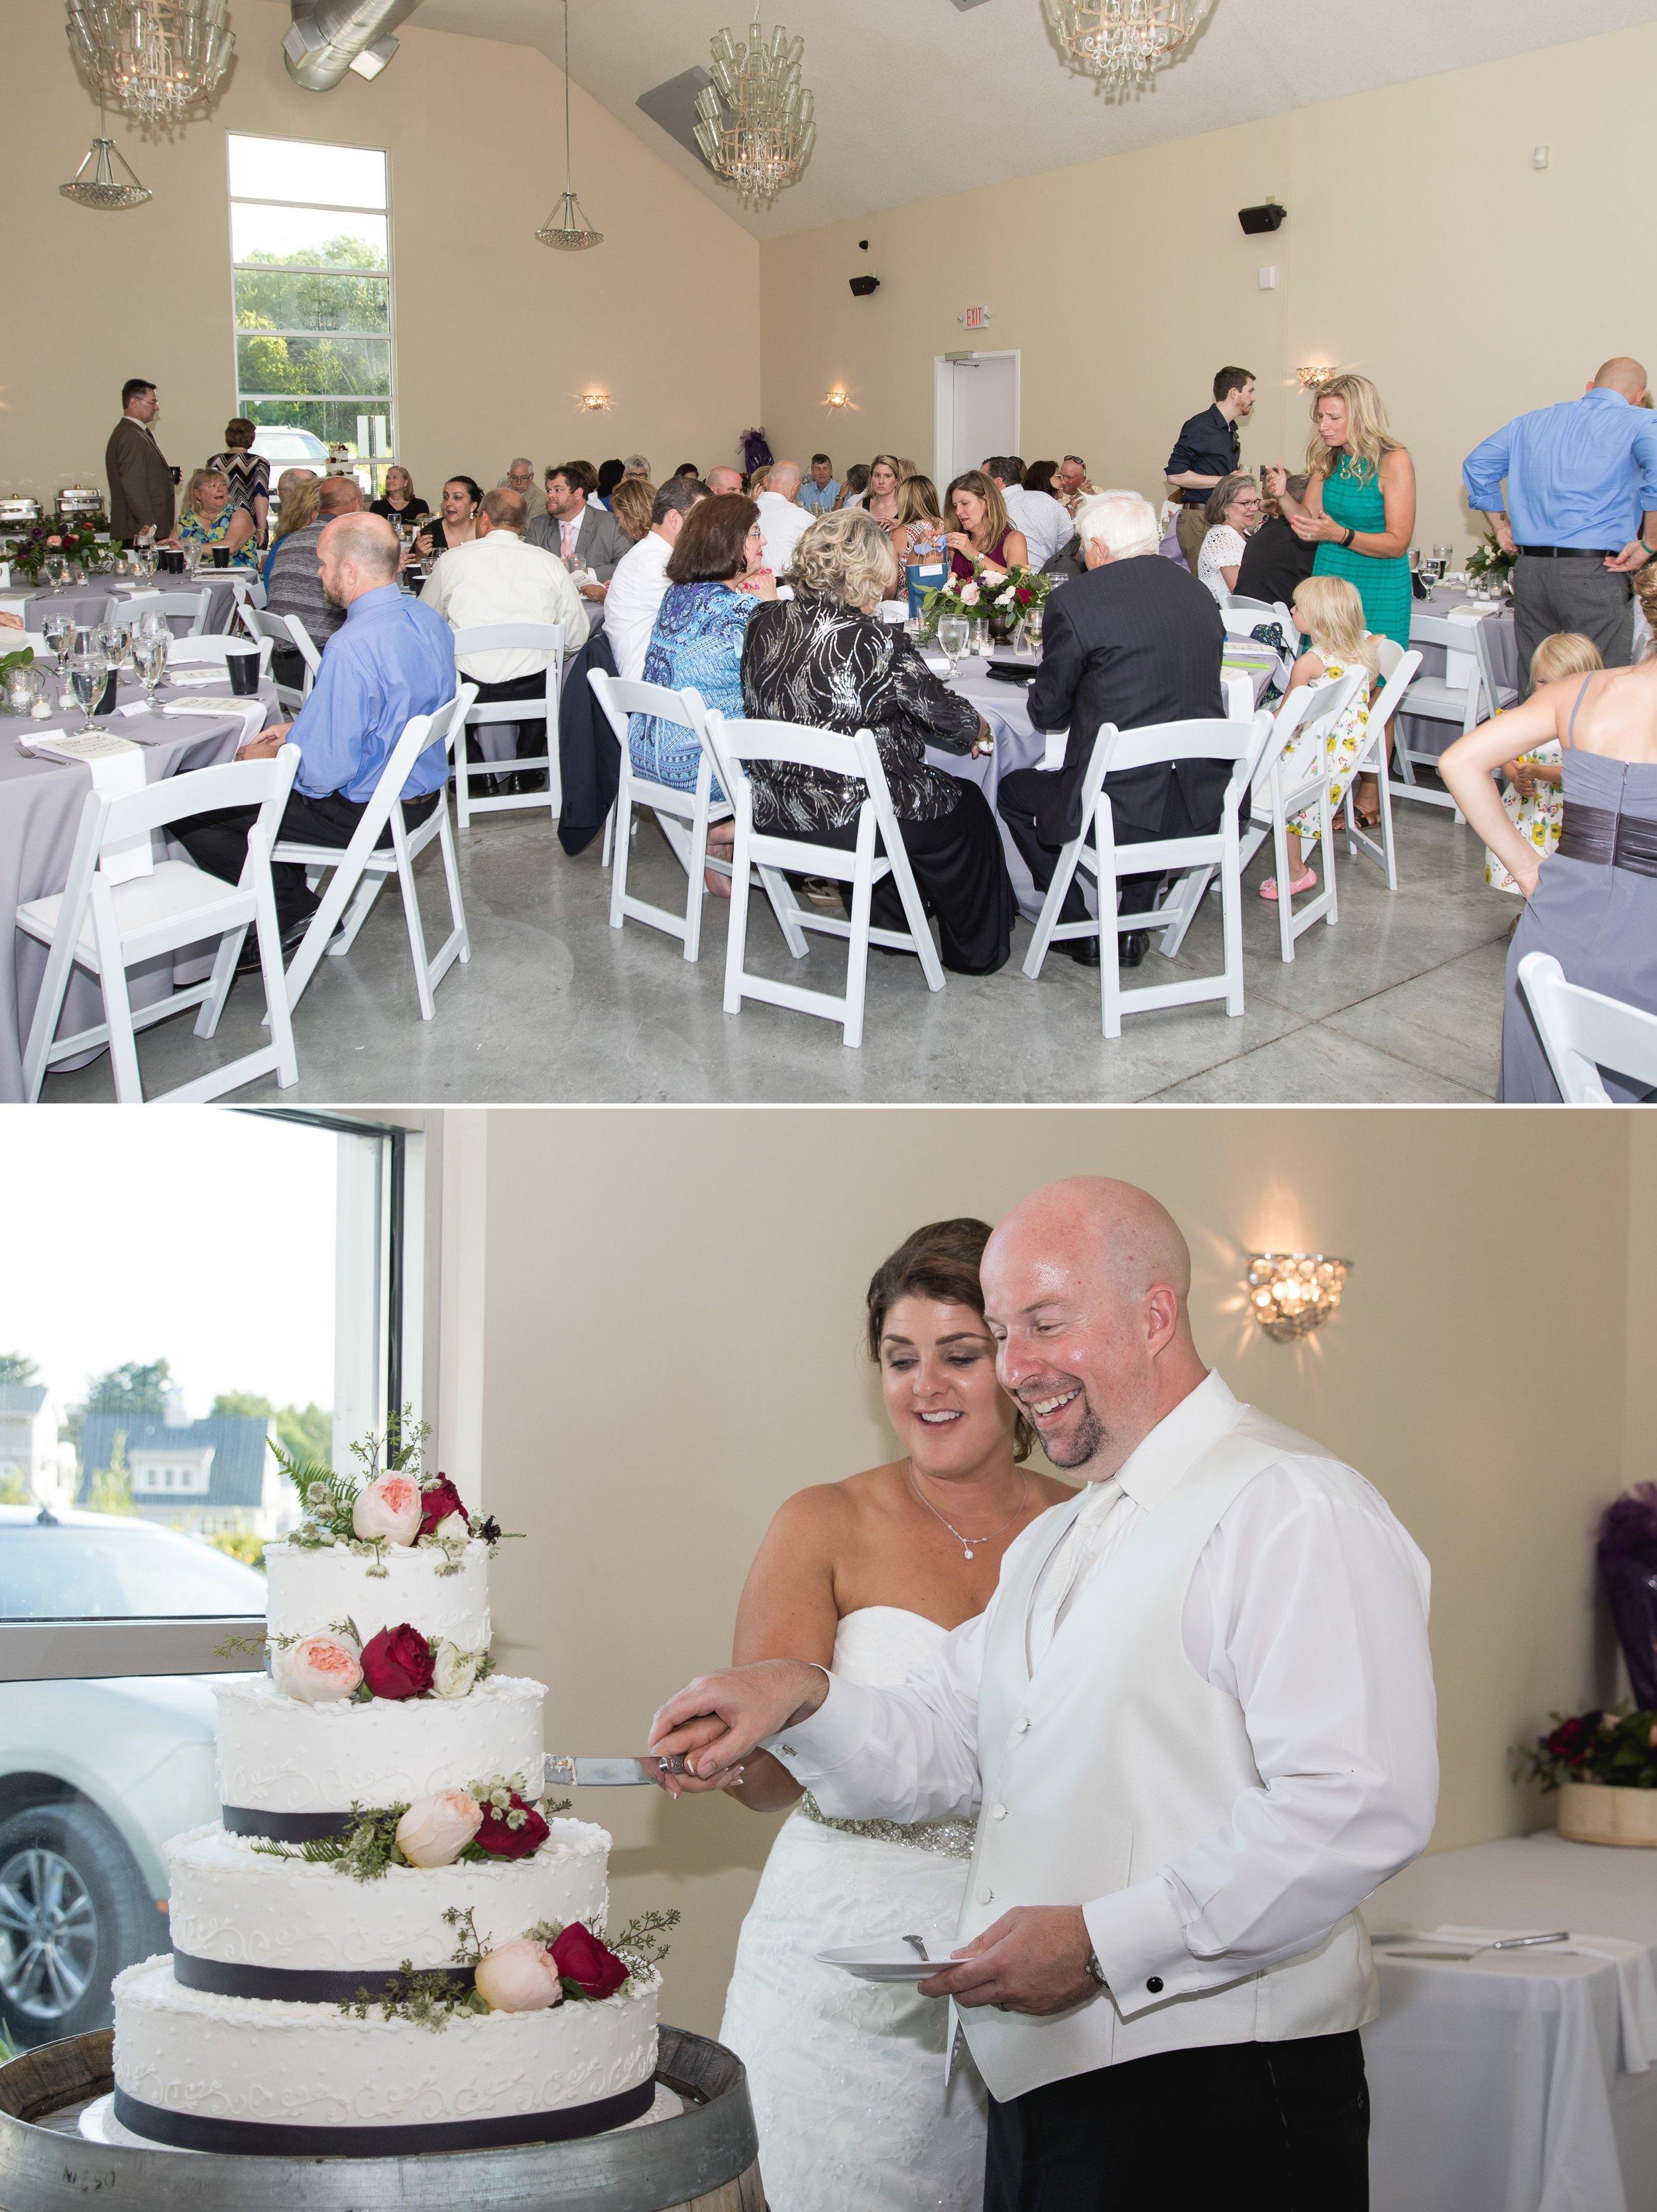 017-Buckeye-lake-winery-wedding-venue-columbus-ohio-wedding-muschlitz-photography-reception-02.JPG